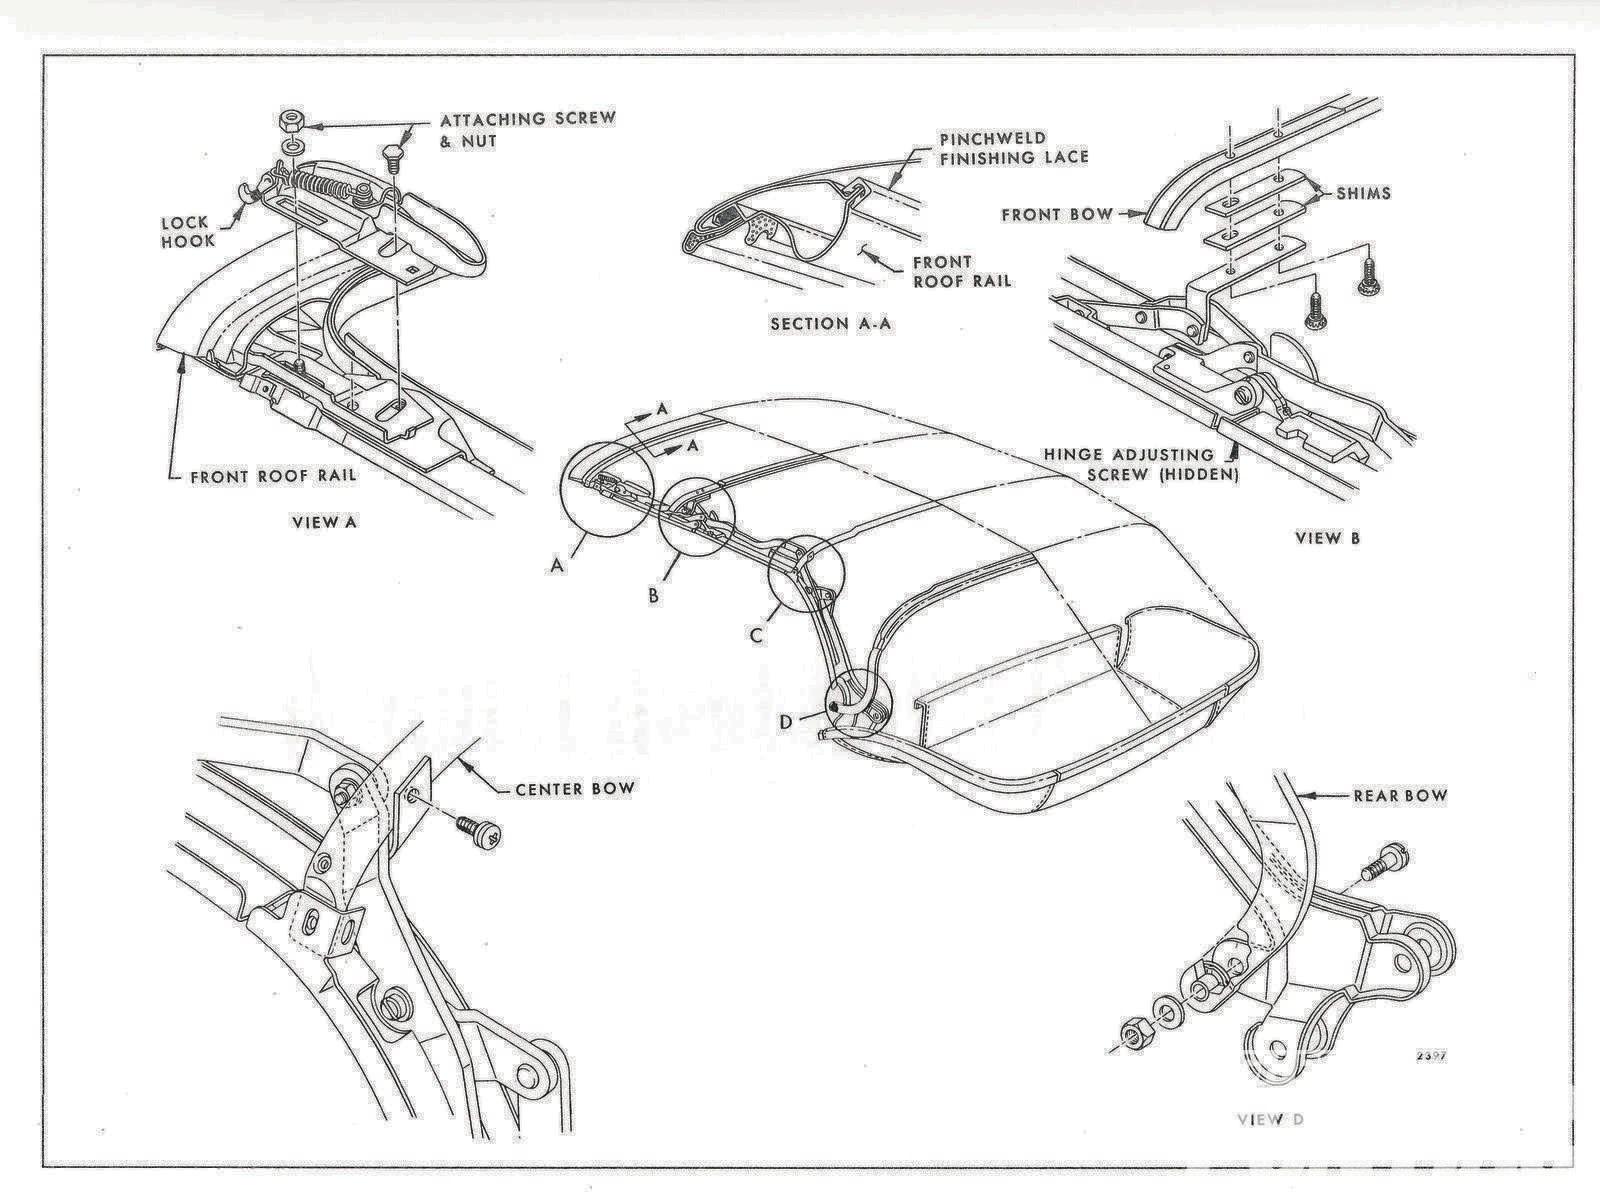 1968 camaro wiring diagram online 1999 bmw z3 stereo pontiac firebird top install hot rod network